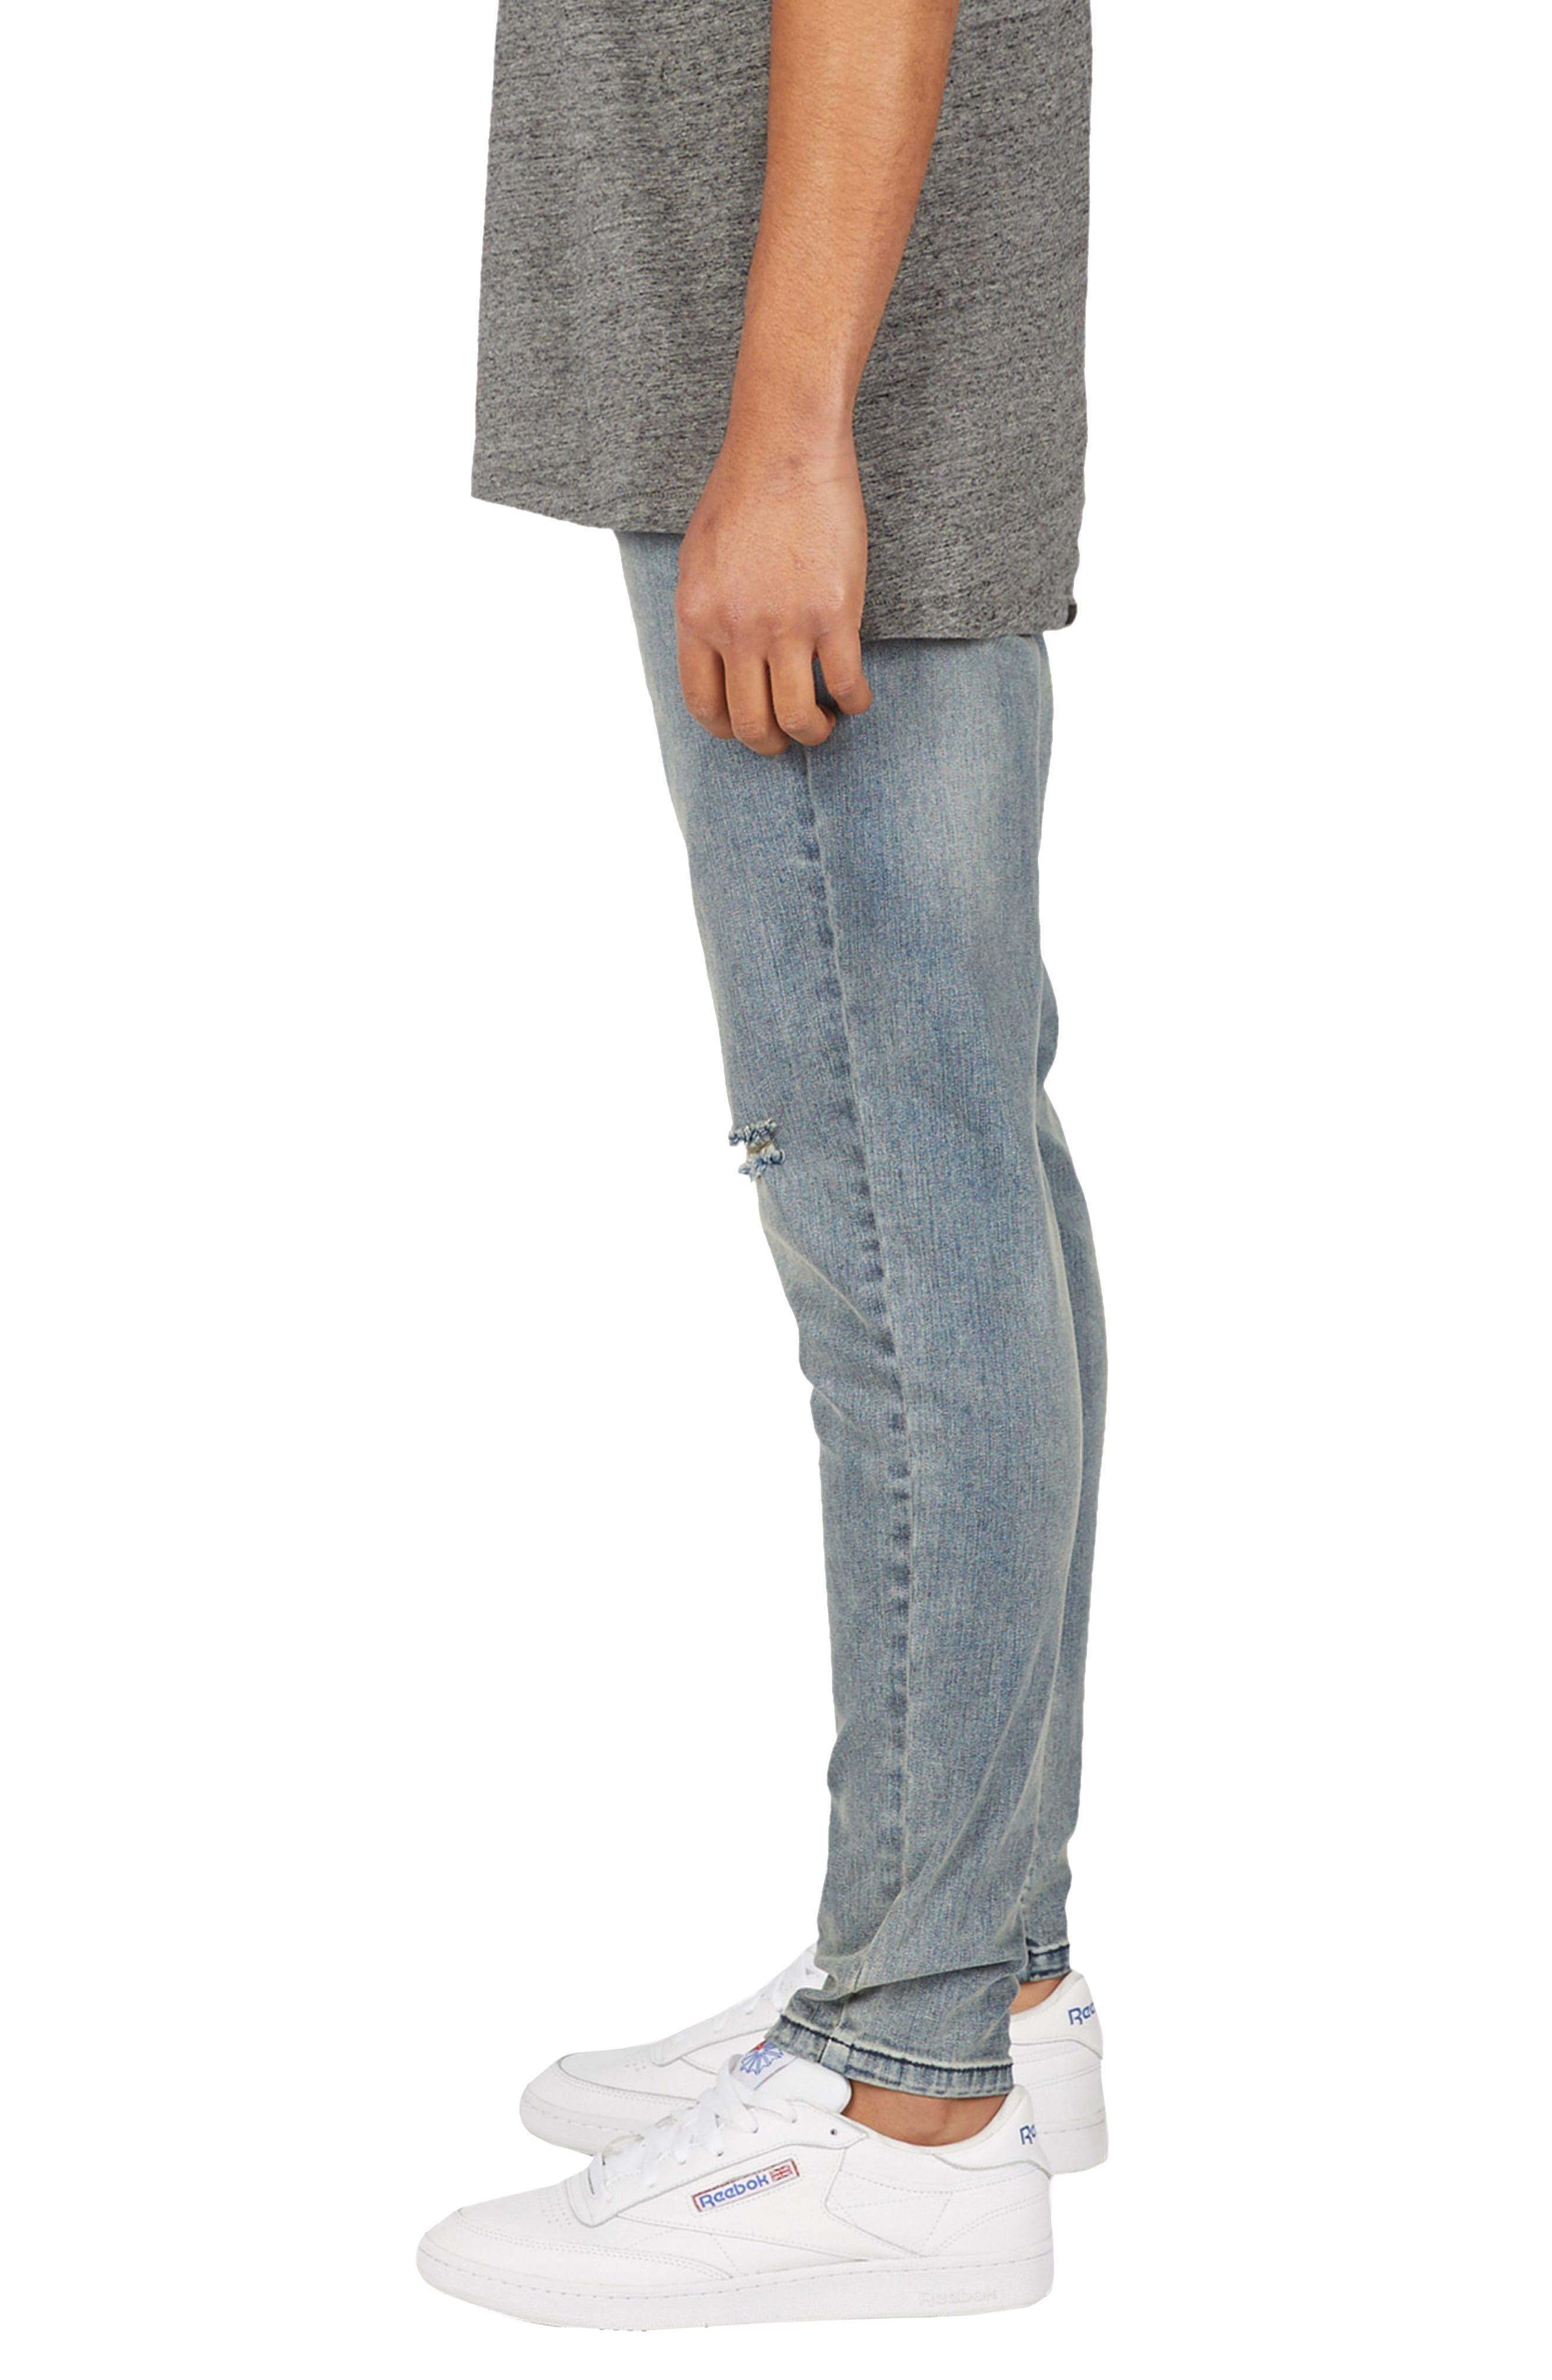 Sharpshot Slouchy Slim Fit Jeans,                             Alternate thumbnail 3, color,                             Double Indigo